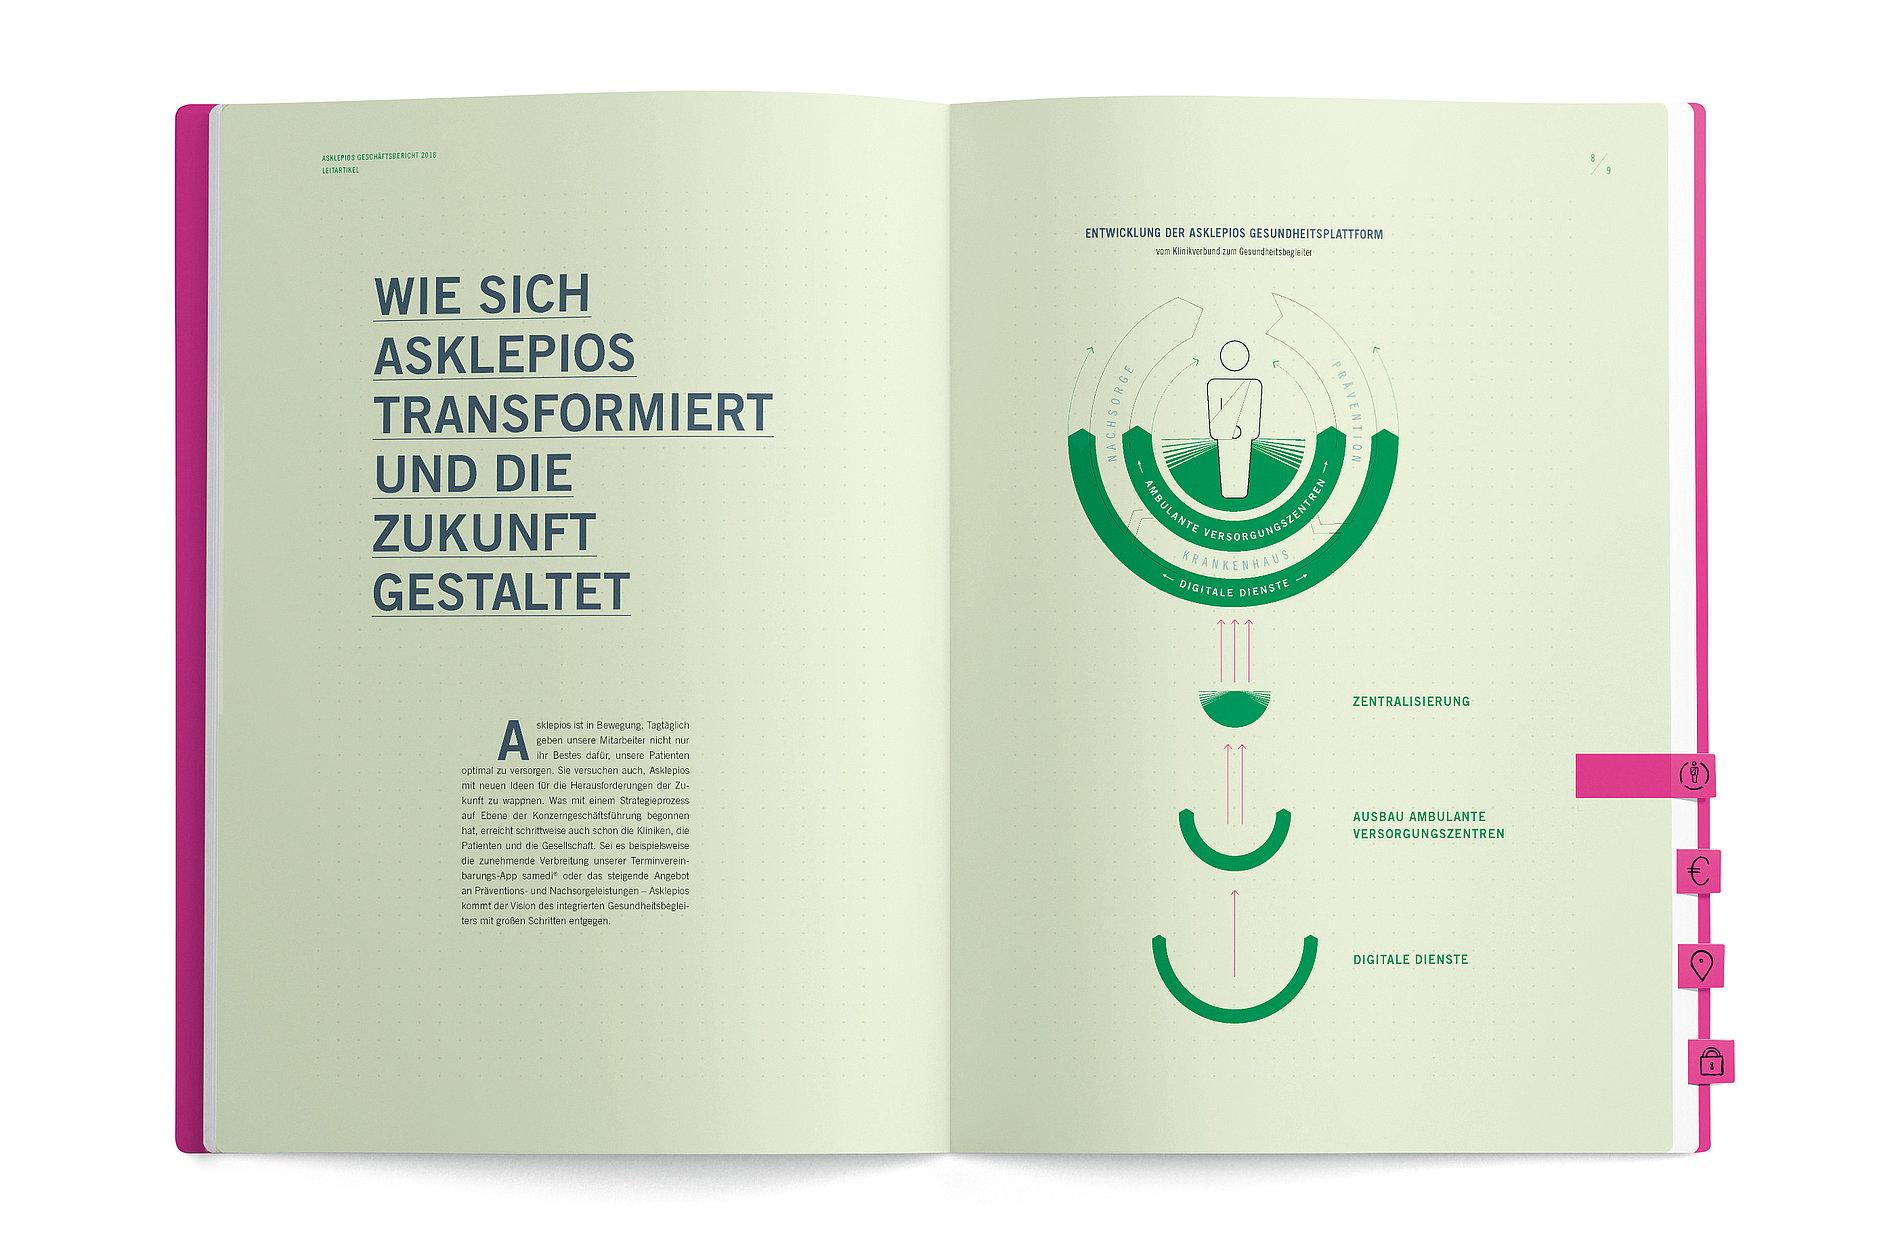 Asklepios Annual Report 2018 | Red Dot Design Award